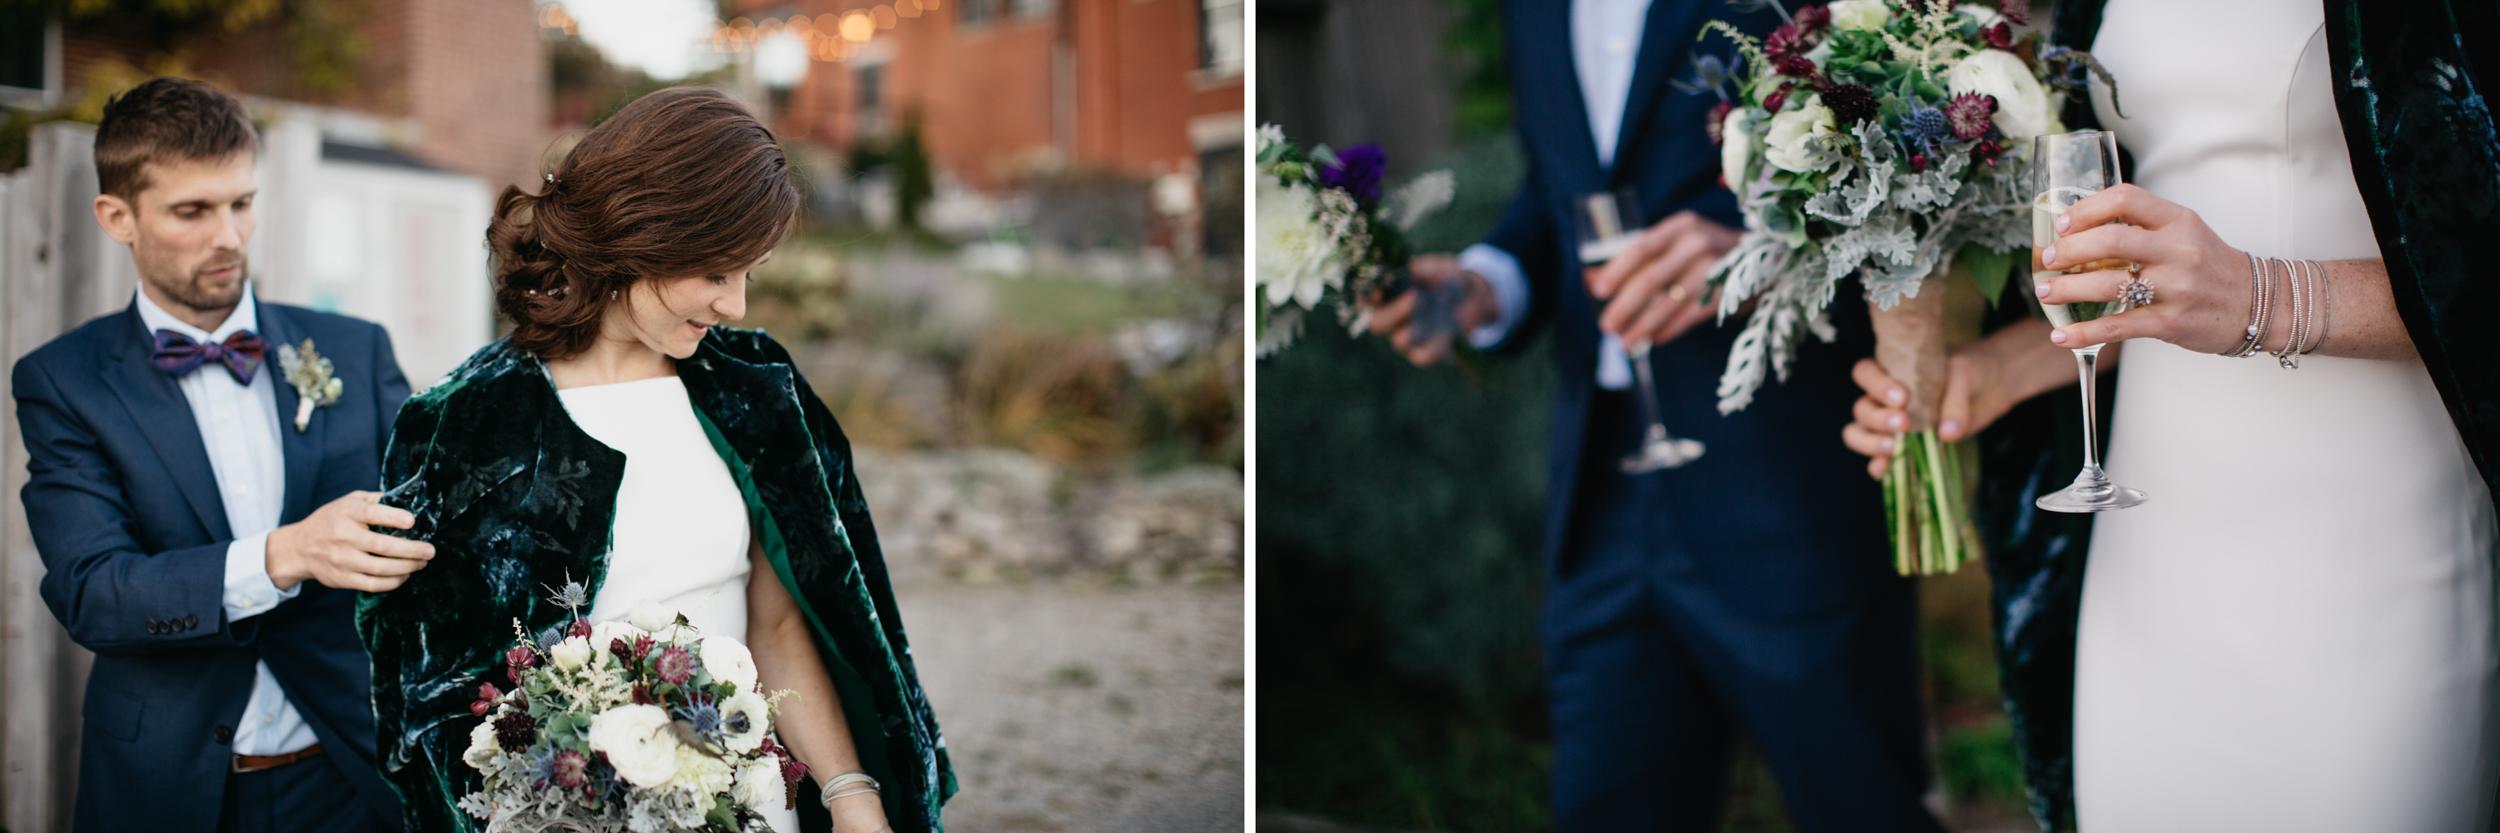 Mackenzie_Collins_Maine_wedding_in_Rockport_Union_hall_Nina_June_031.jpg